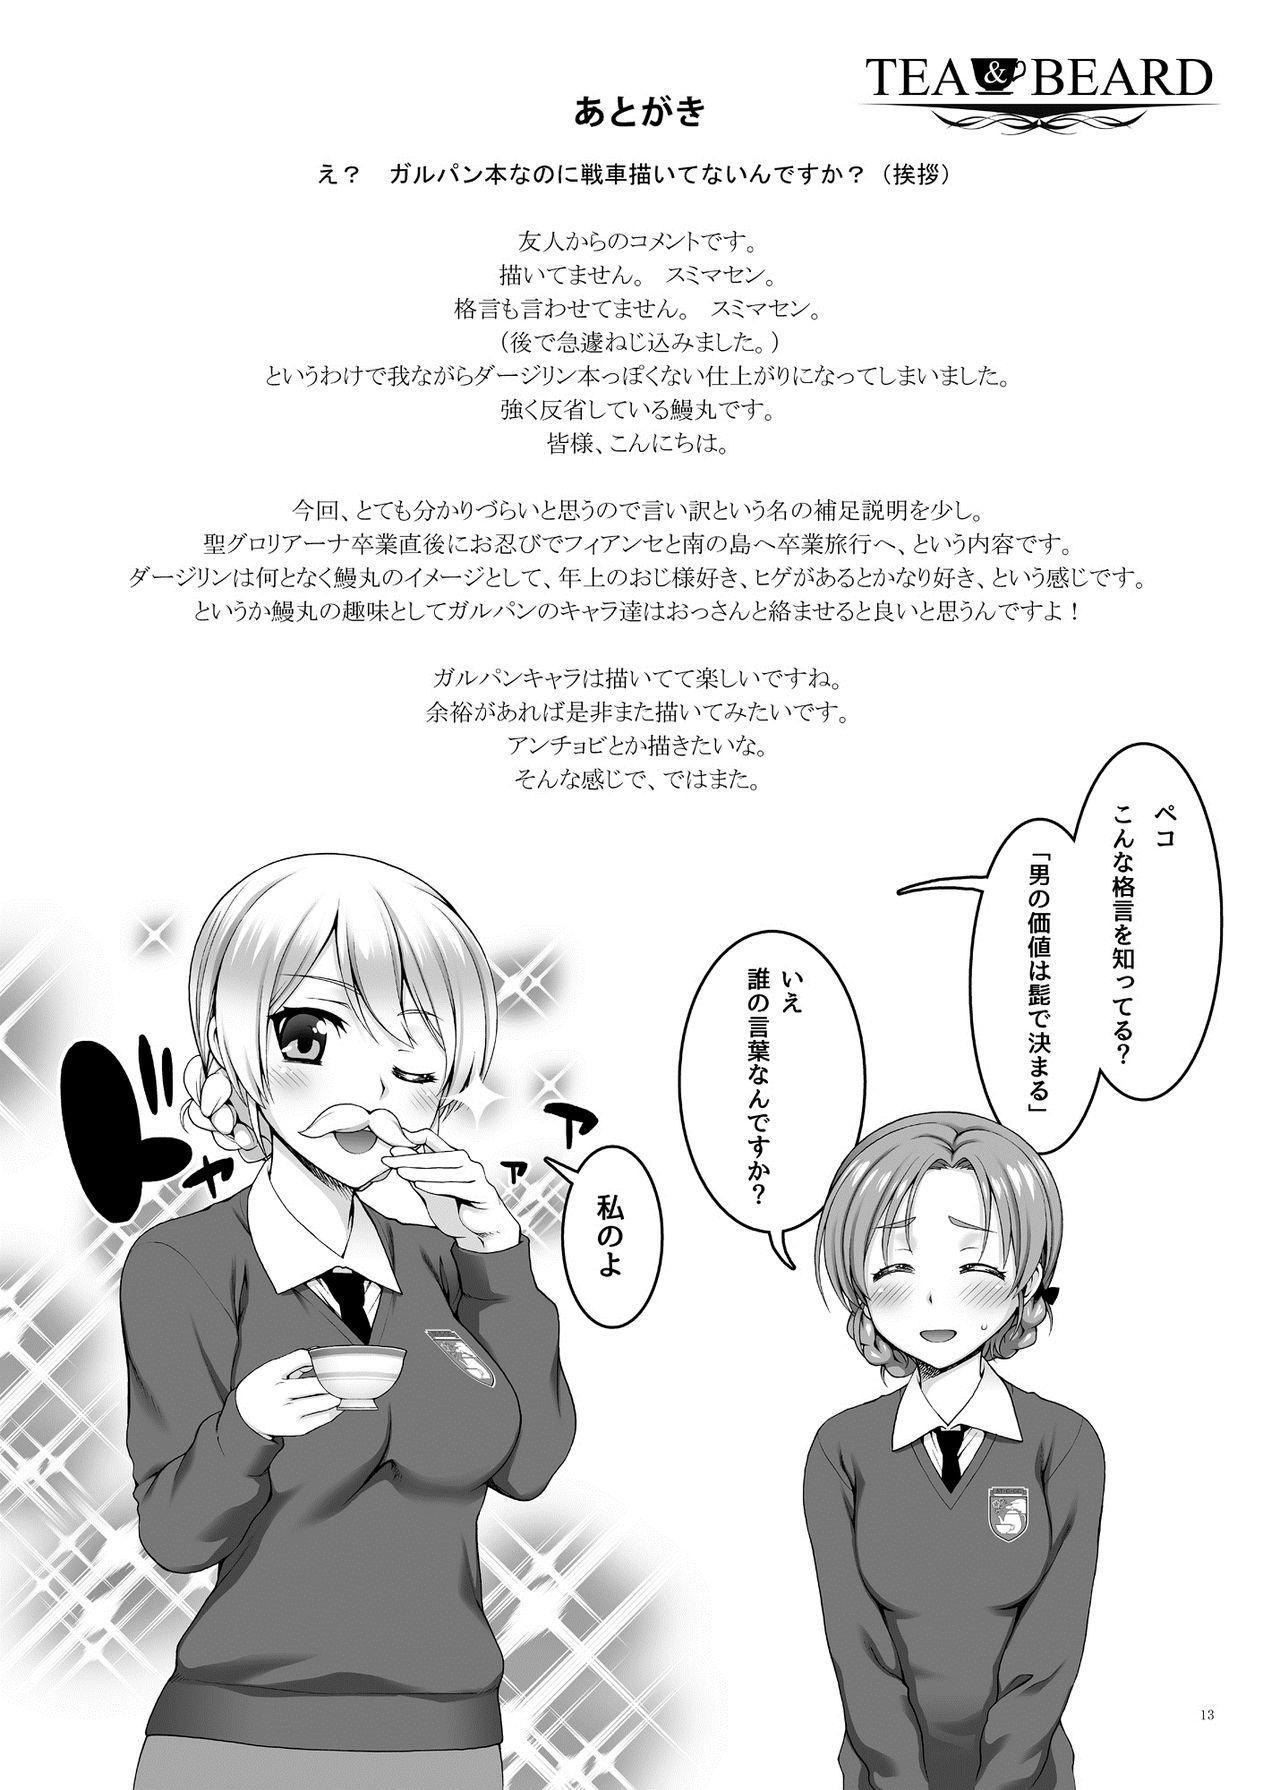 TEA&BEARD 11